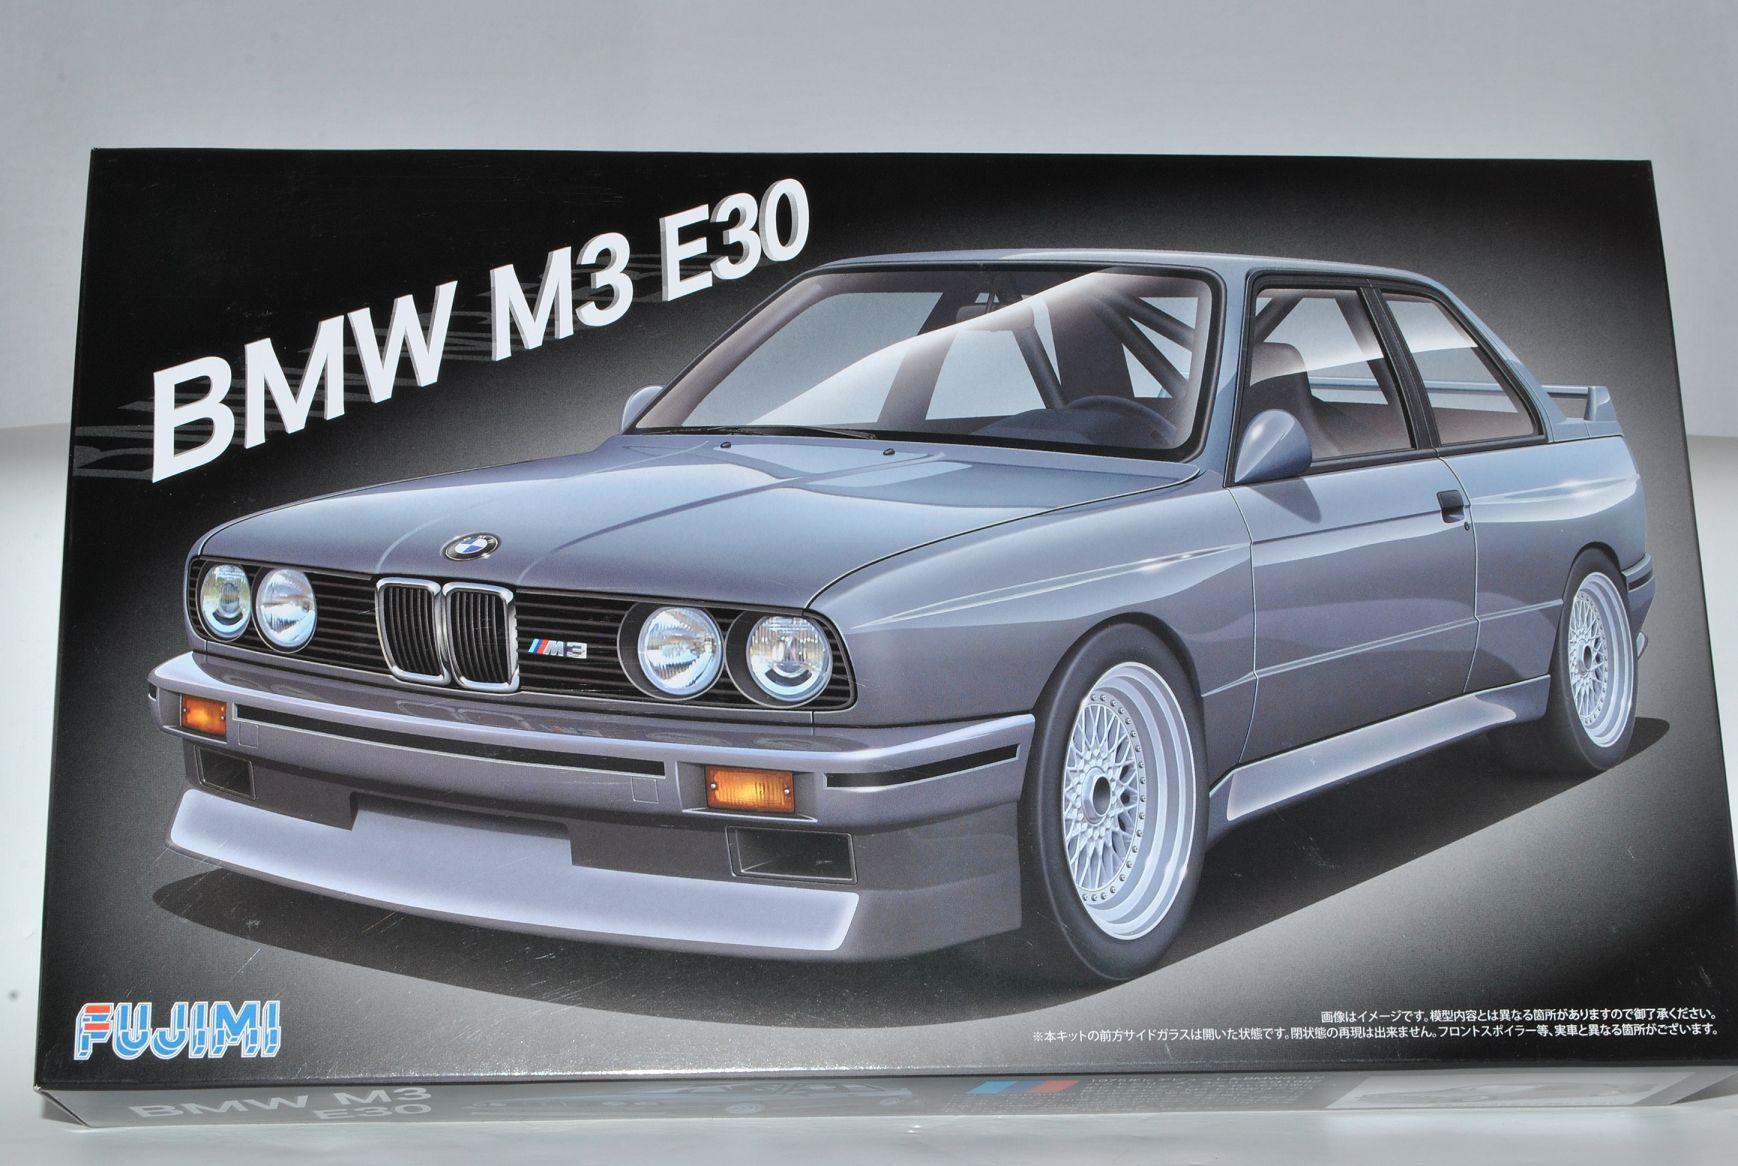 BMW 3er M3 E30 Coupe 3 Türer 1982-1994 Kit Bausatz 1//24 Fujimi Modell Auto mit..